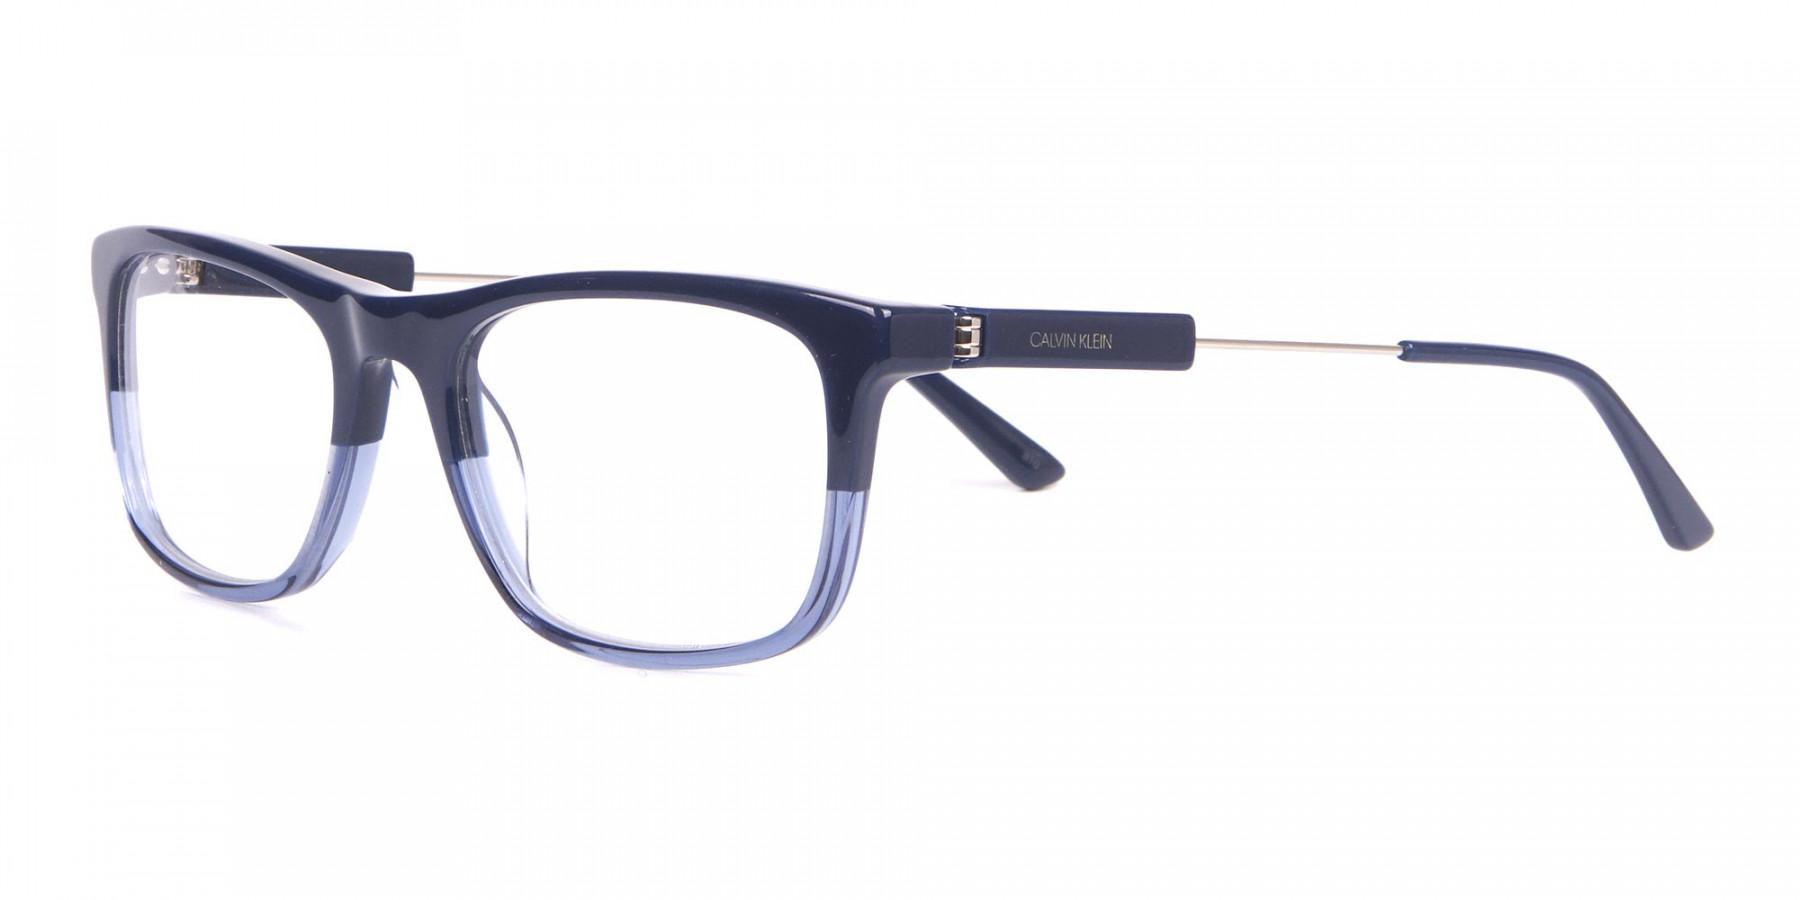 Calvin Klein CK19707 Two-Tone Rectangular Glasses Navy-1